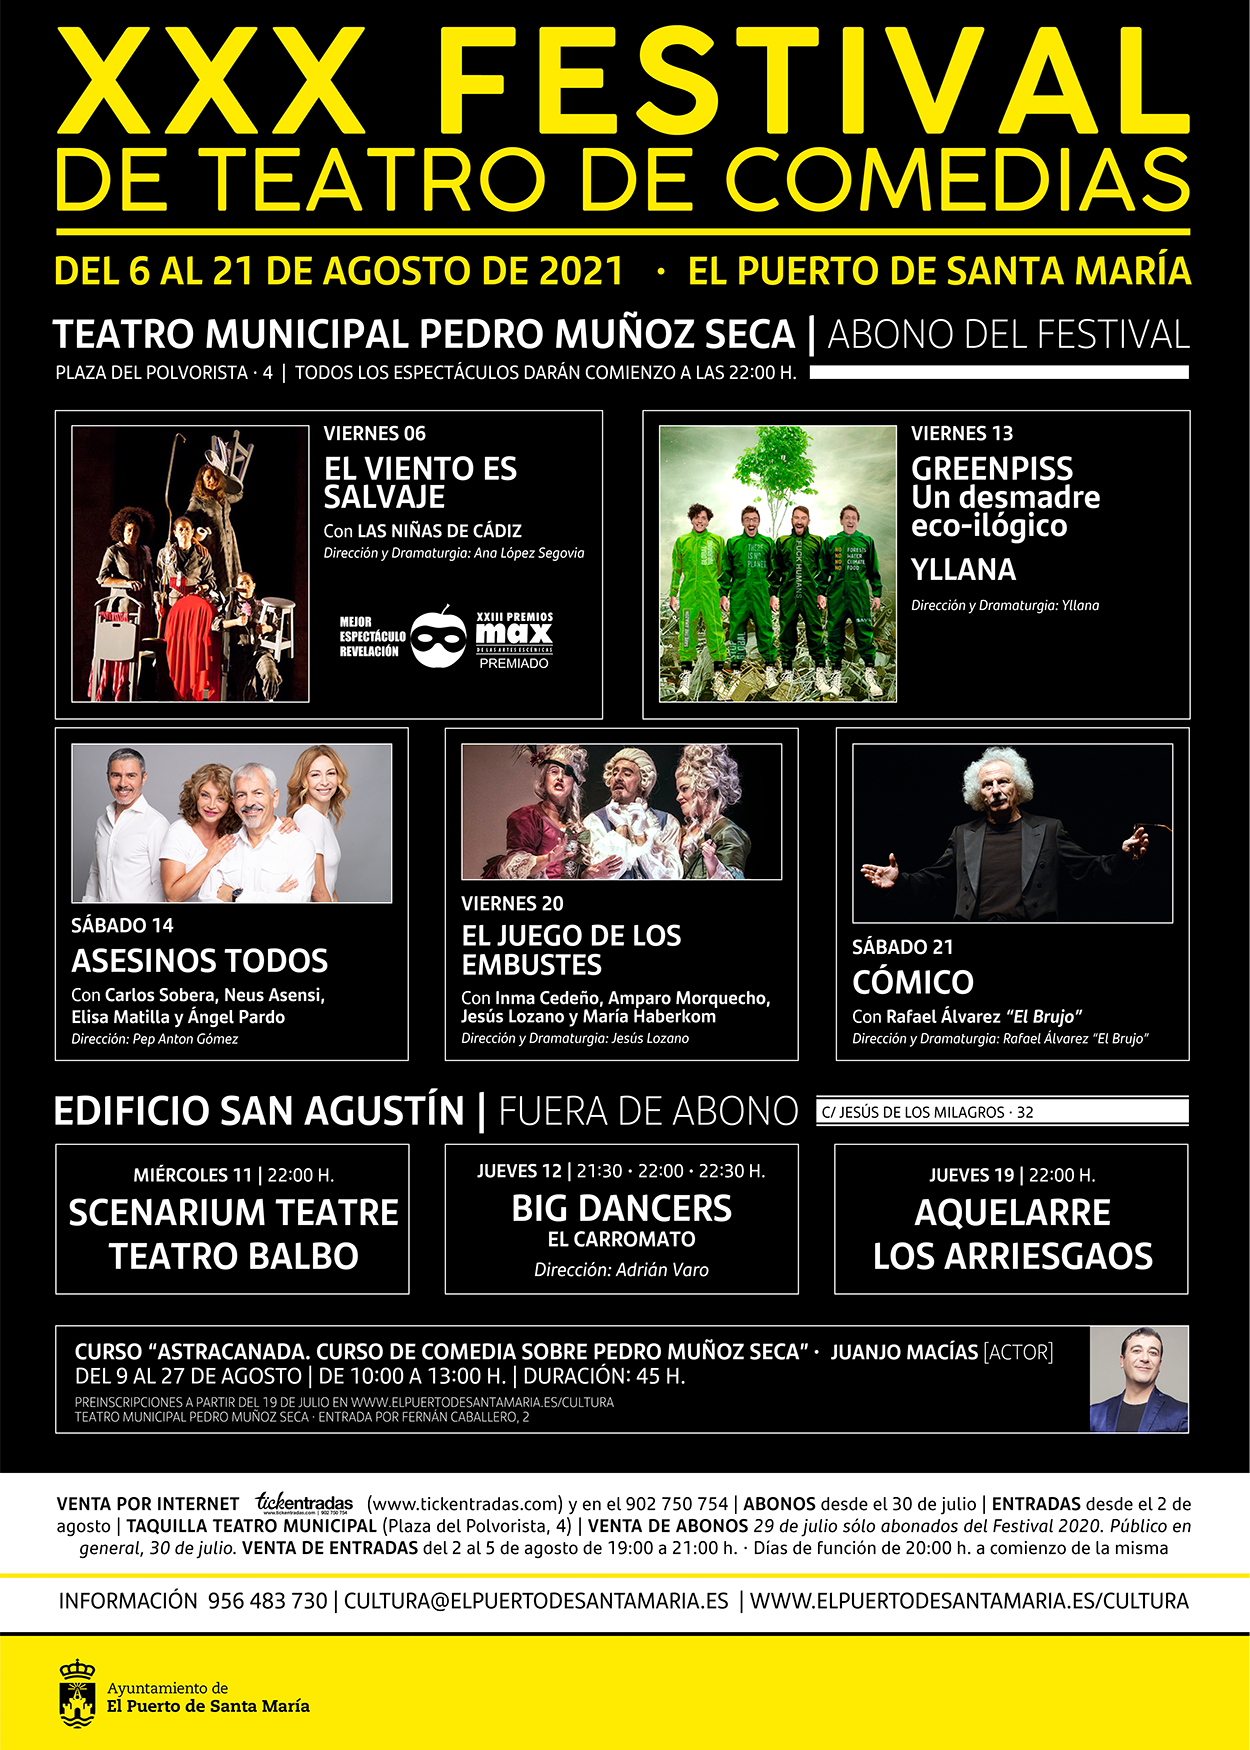 XXX Festival de Teatro de Comedias 2021